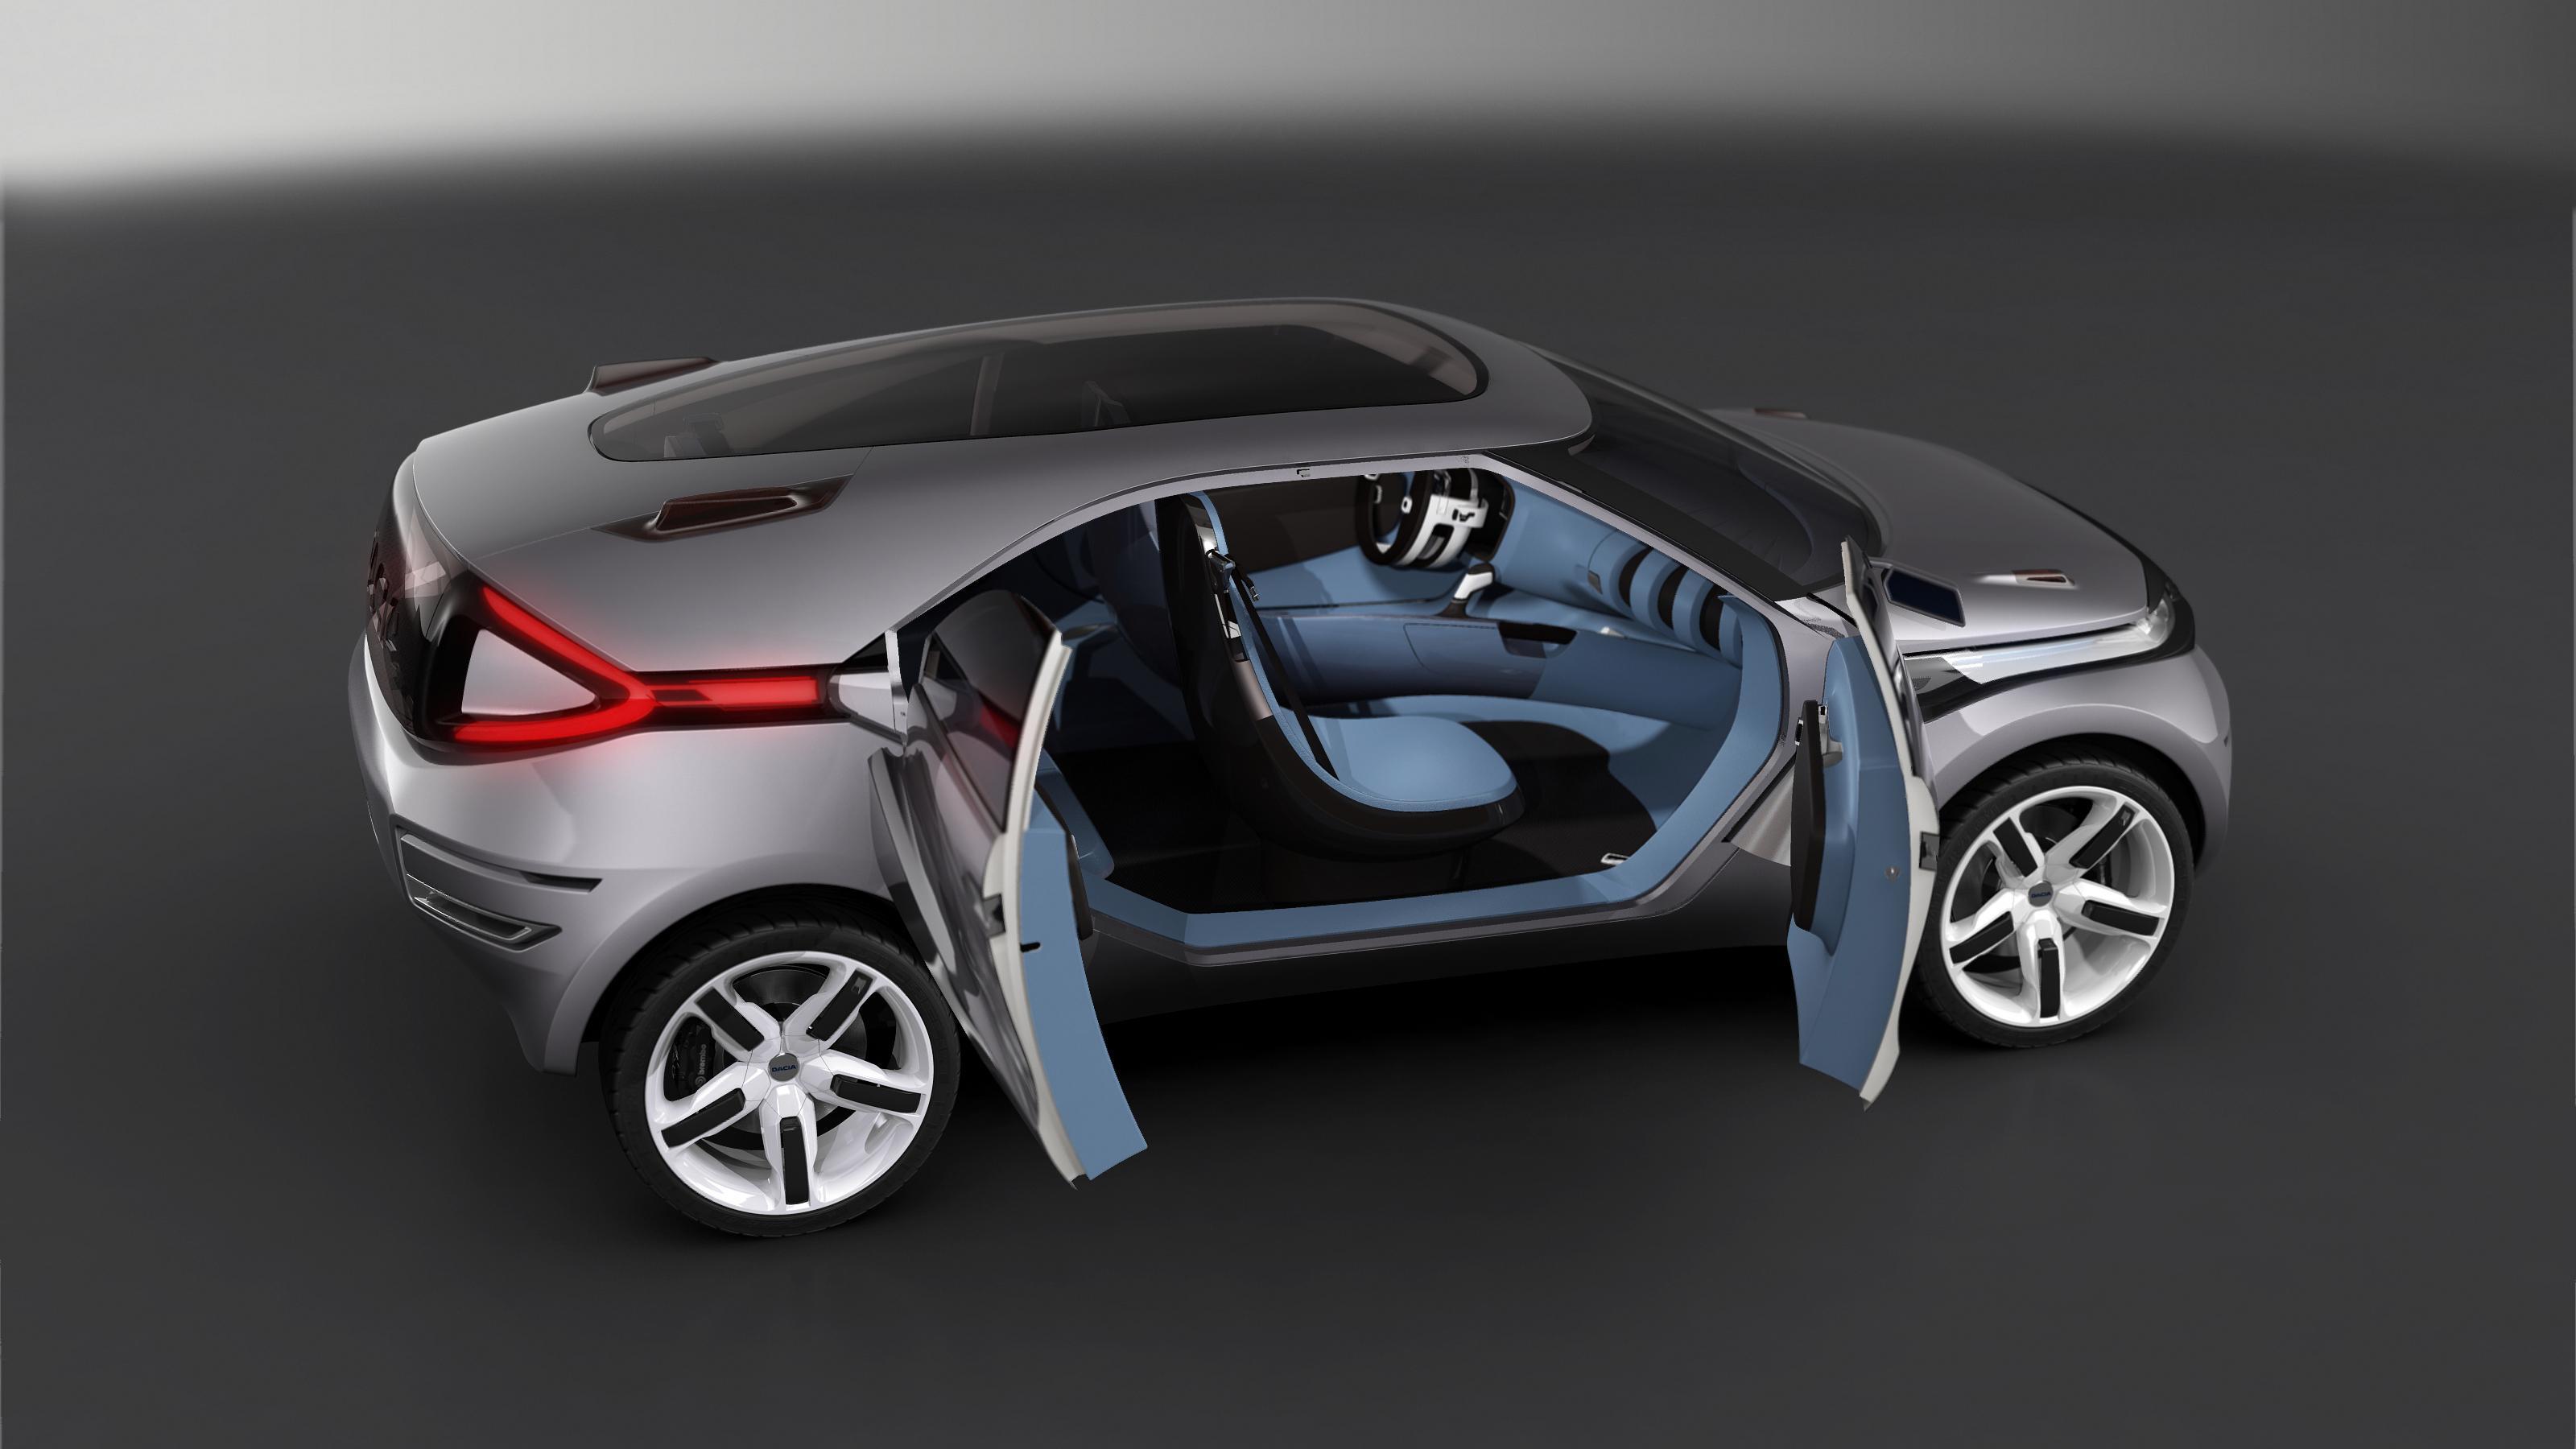 Dacia duster crossover concept picture 15177